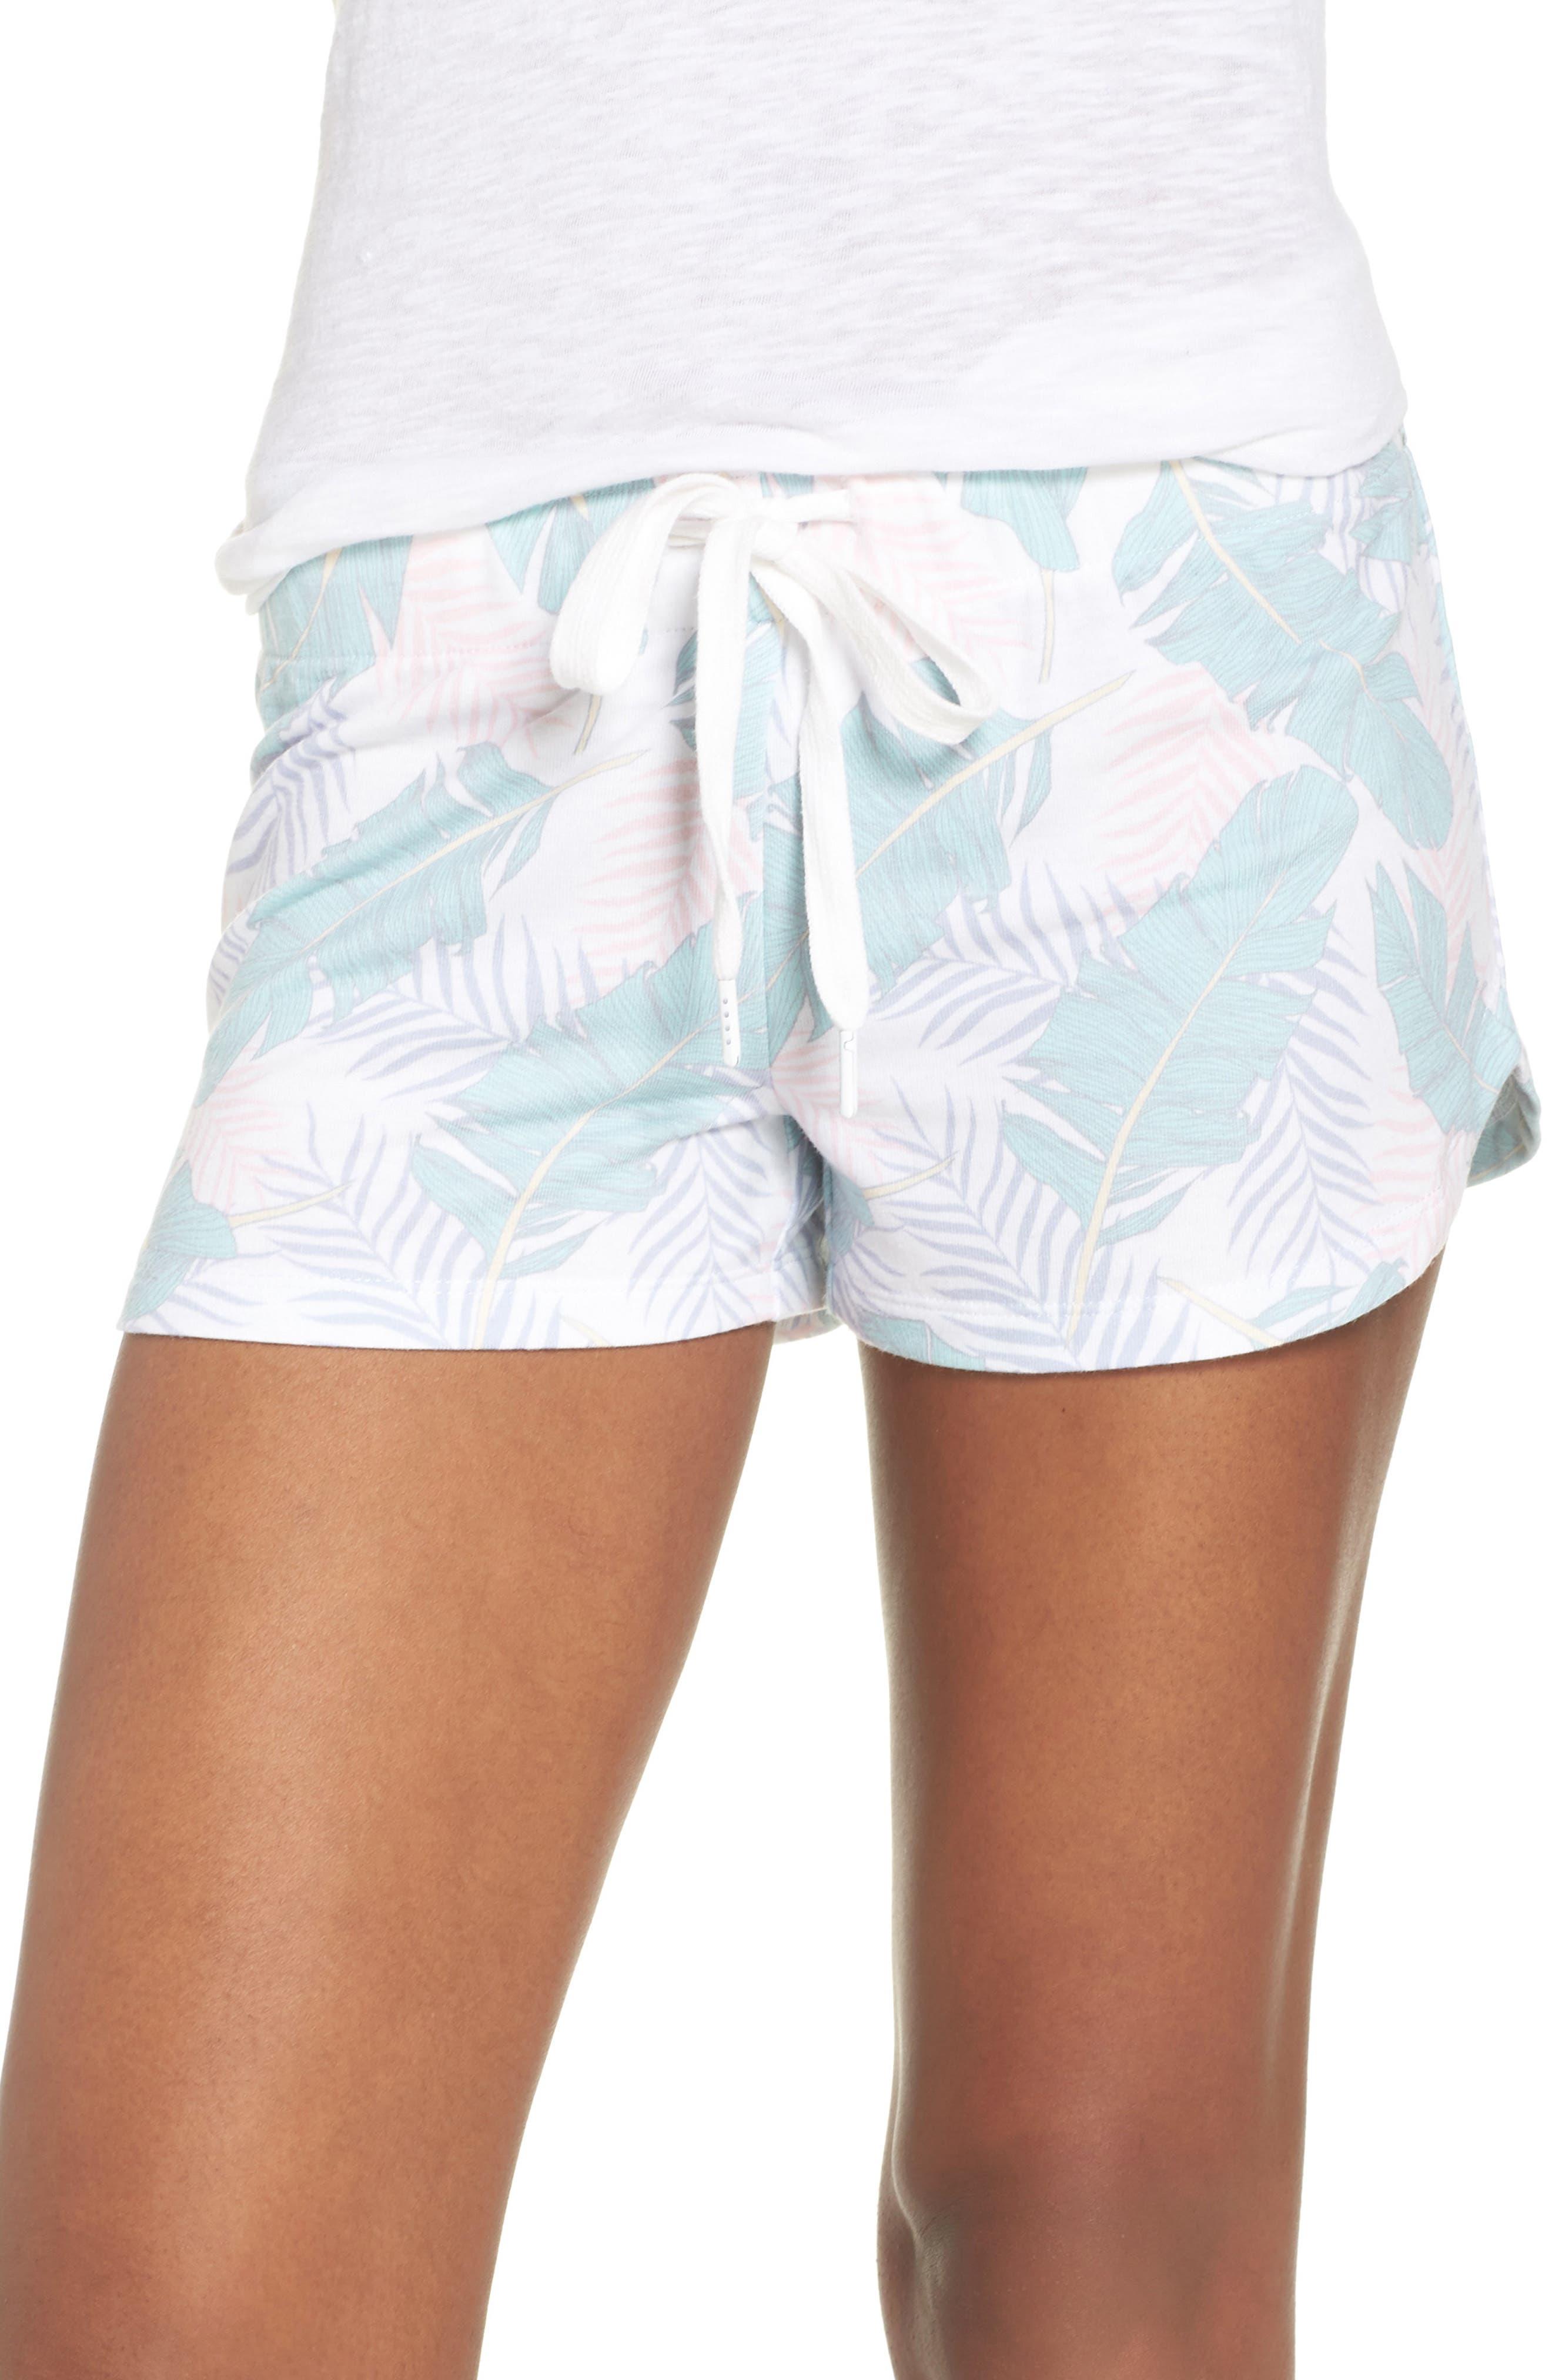 Lounge Shorts,                         Main,                         color,